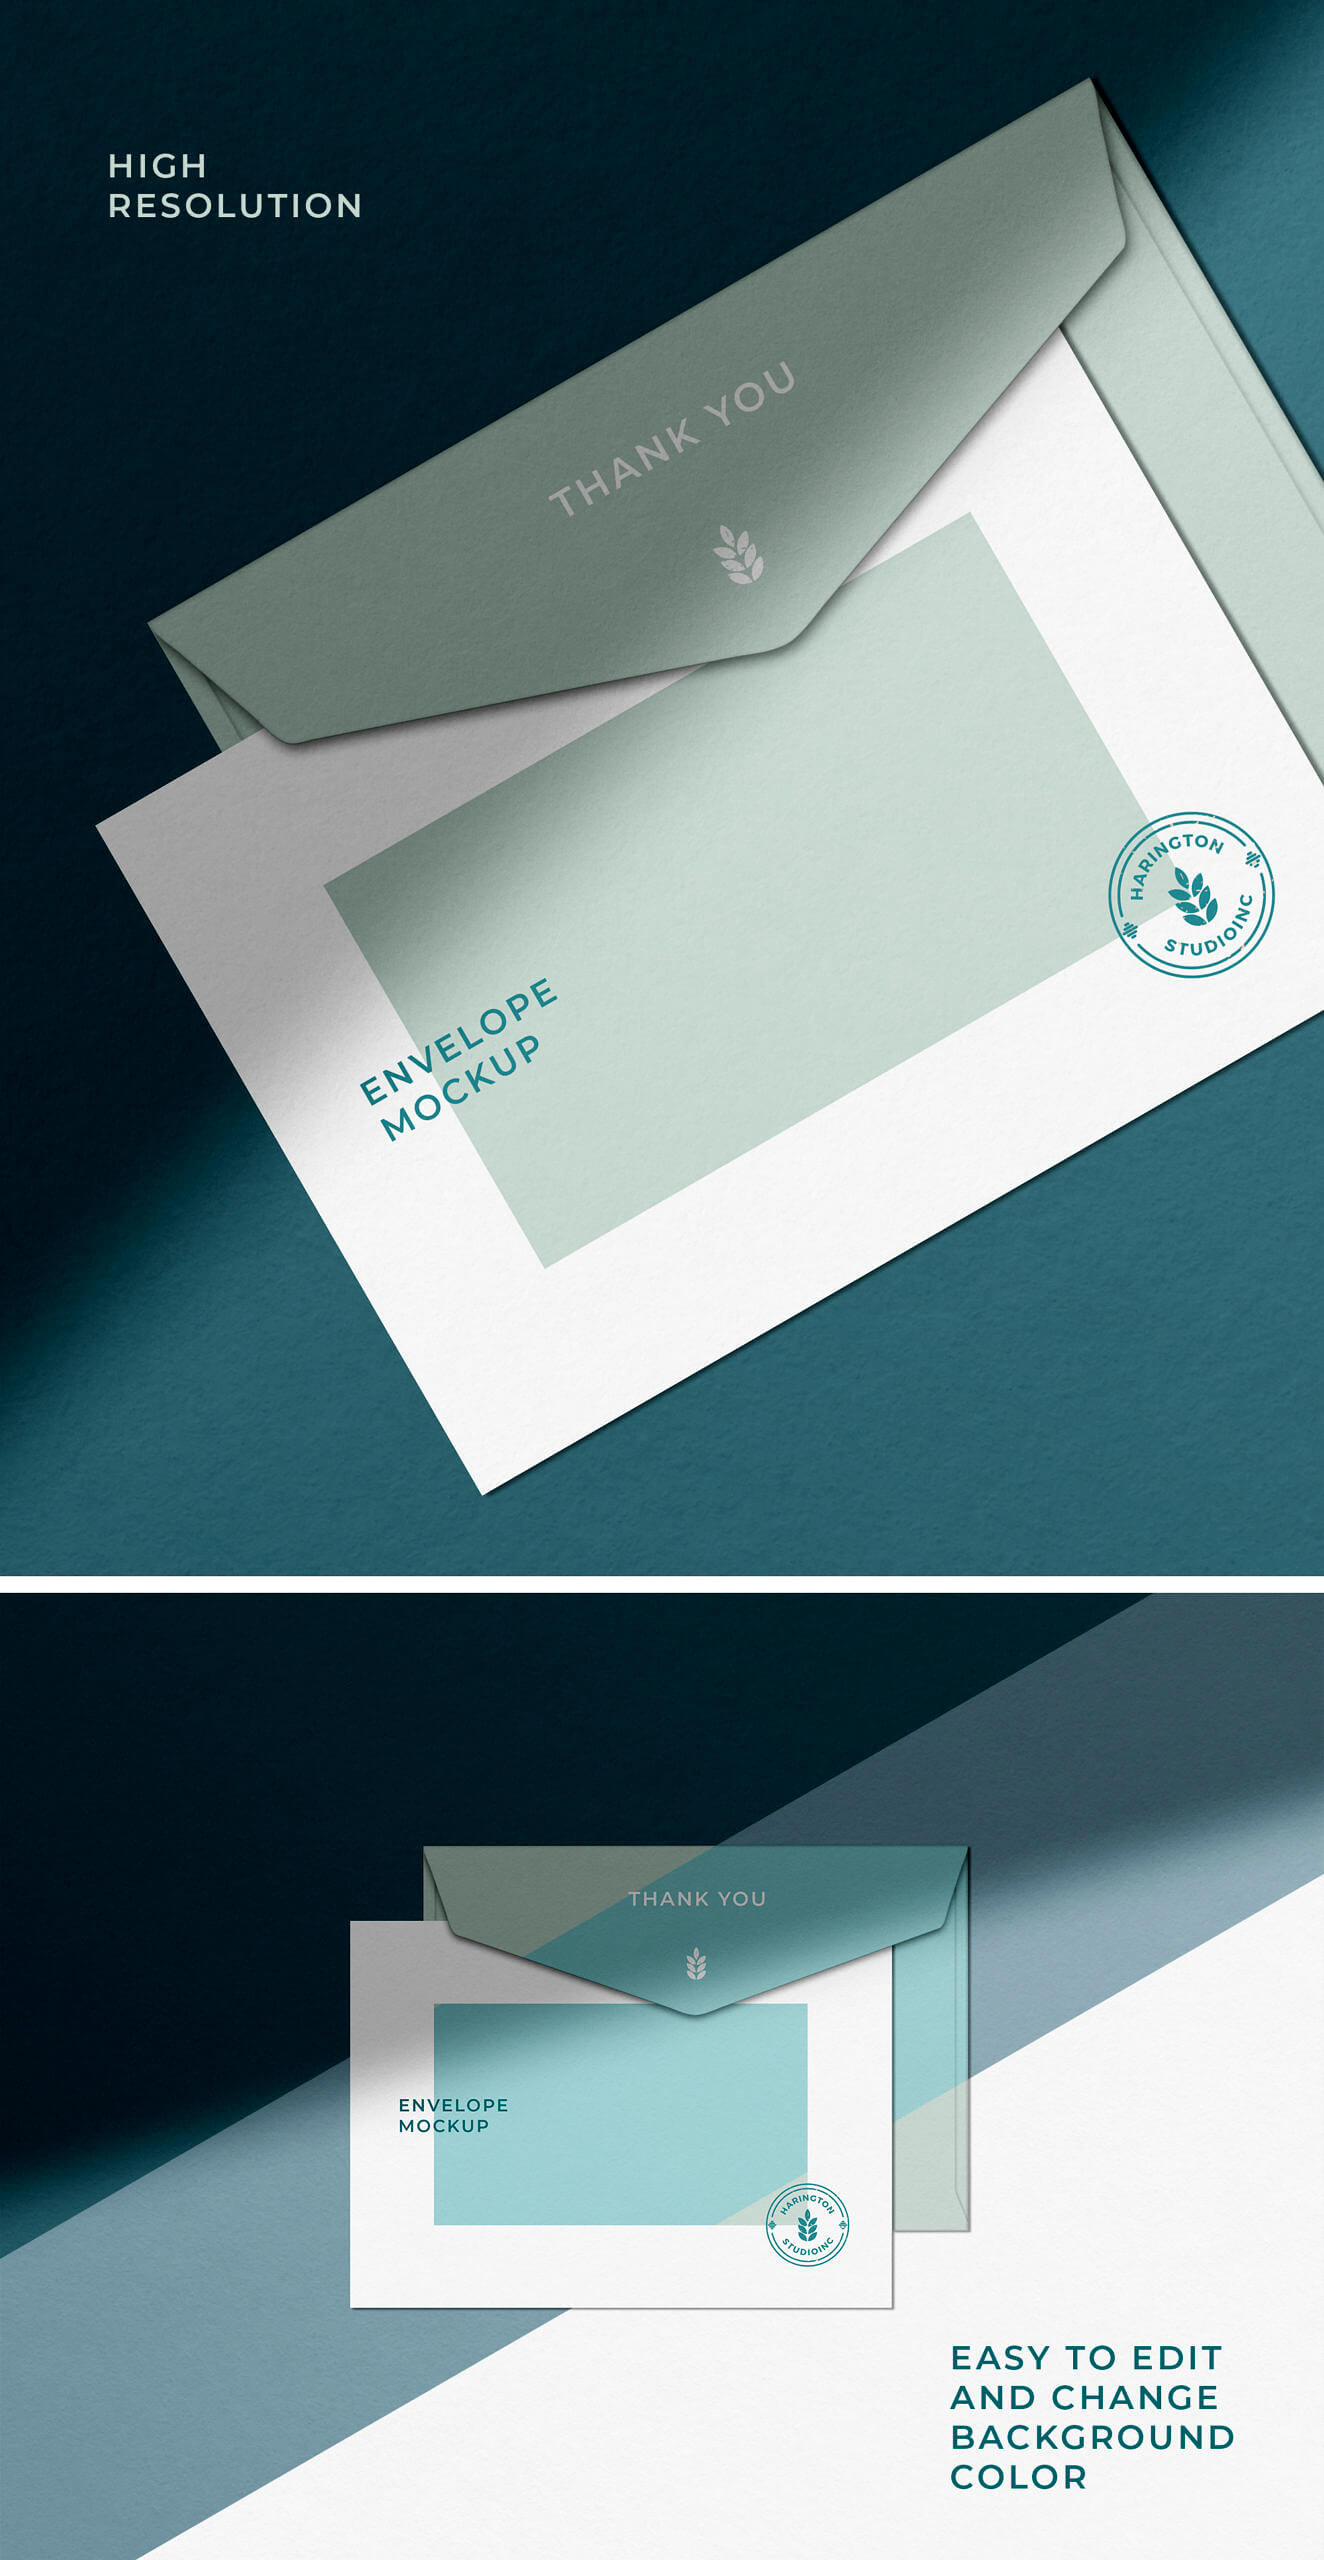 Free Shadow Overlaid Envelope Mockup Vol-02 PSD Template1